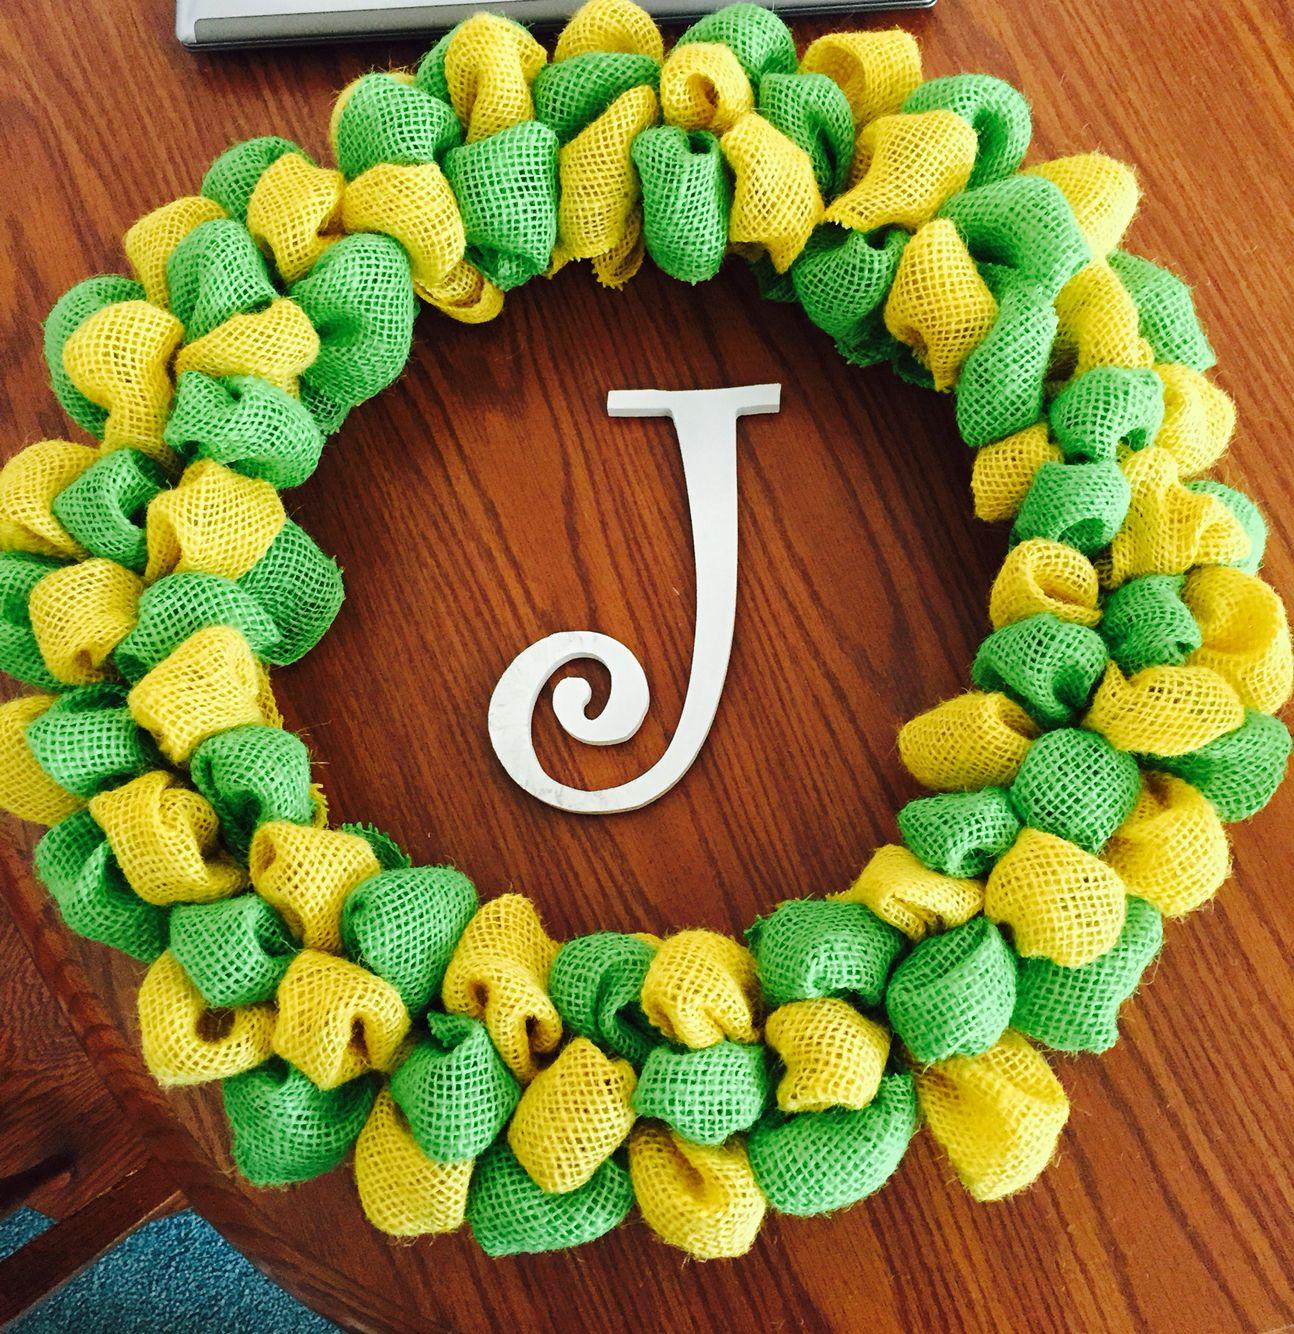 DIY Burlap Wreath w 2 Colors #burlap #johndeere #homemade #wreath #diy